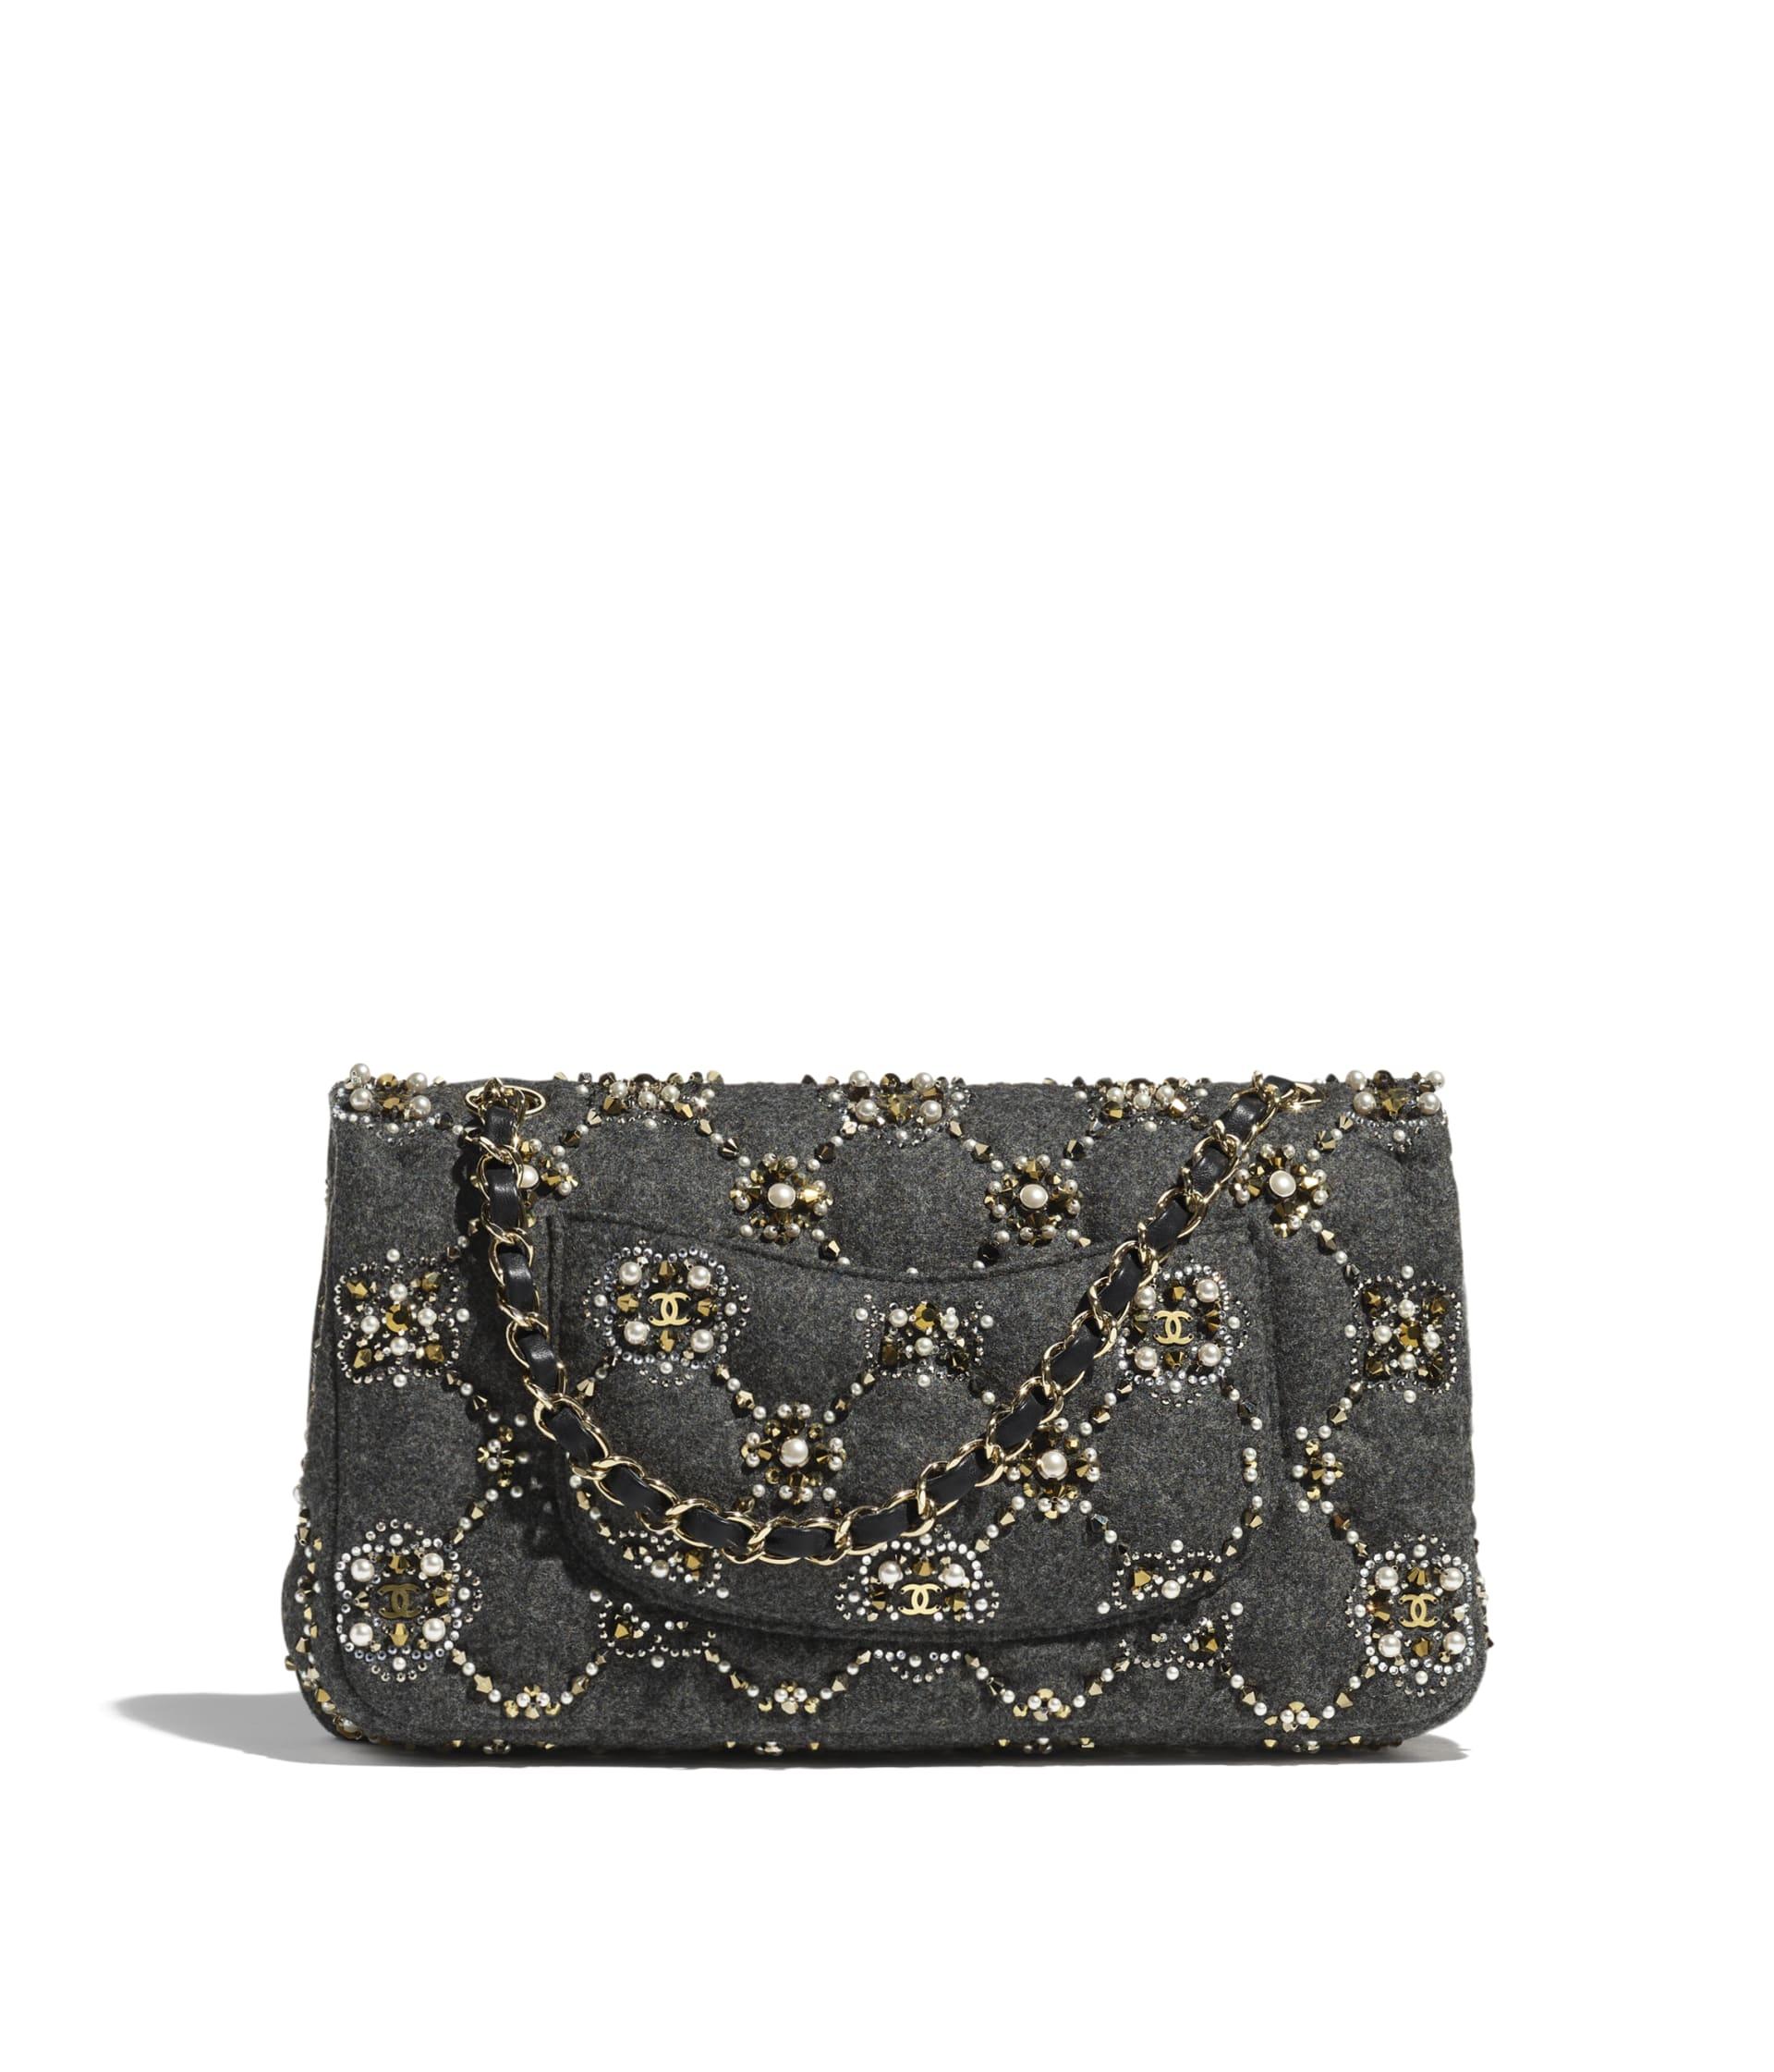 image 2 - Classic Handbag - Wool, Glass Pearls, Crystal Pearls & Gold-Tone Metal - Gray